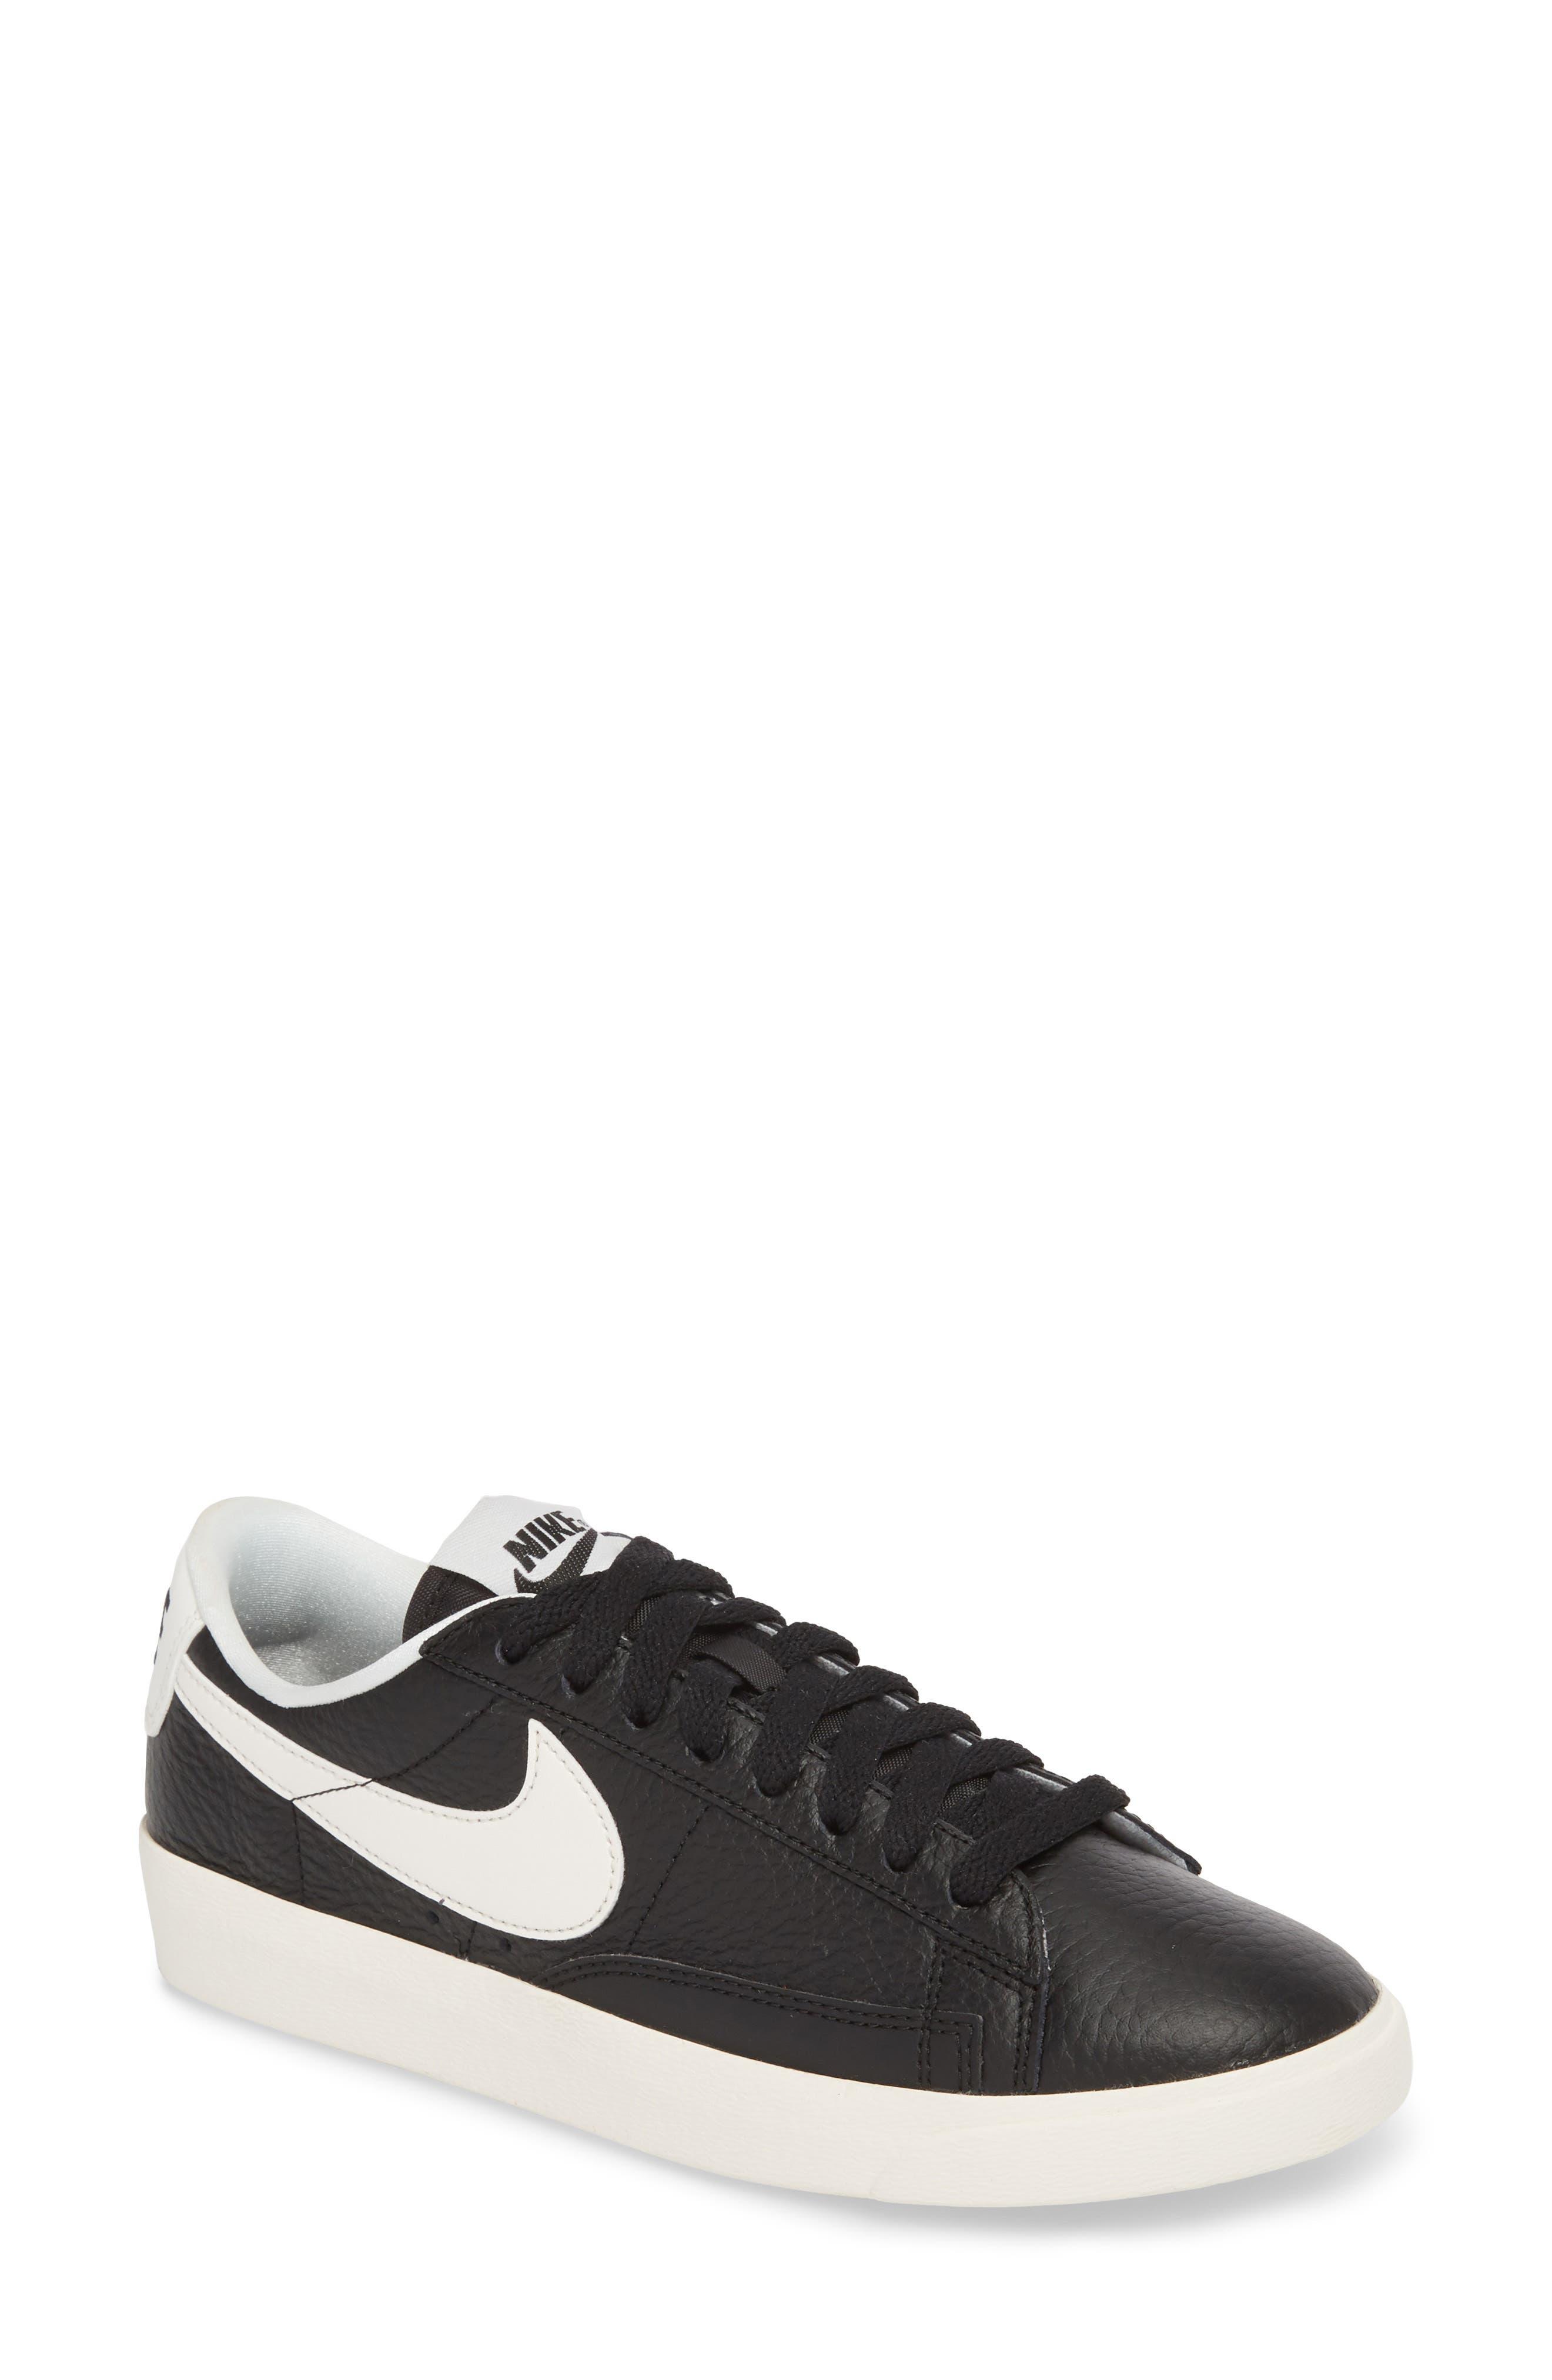 Blazer Premium Low Sneaker,                         Main,                         color, 004